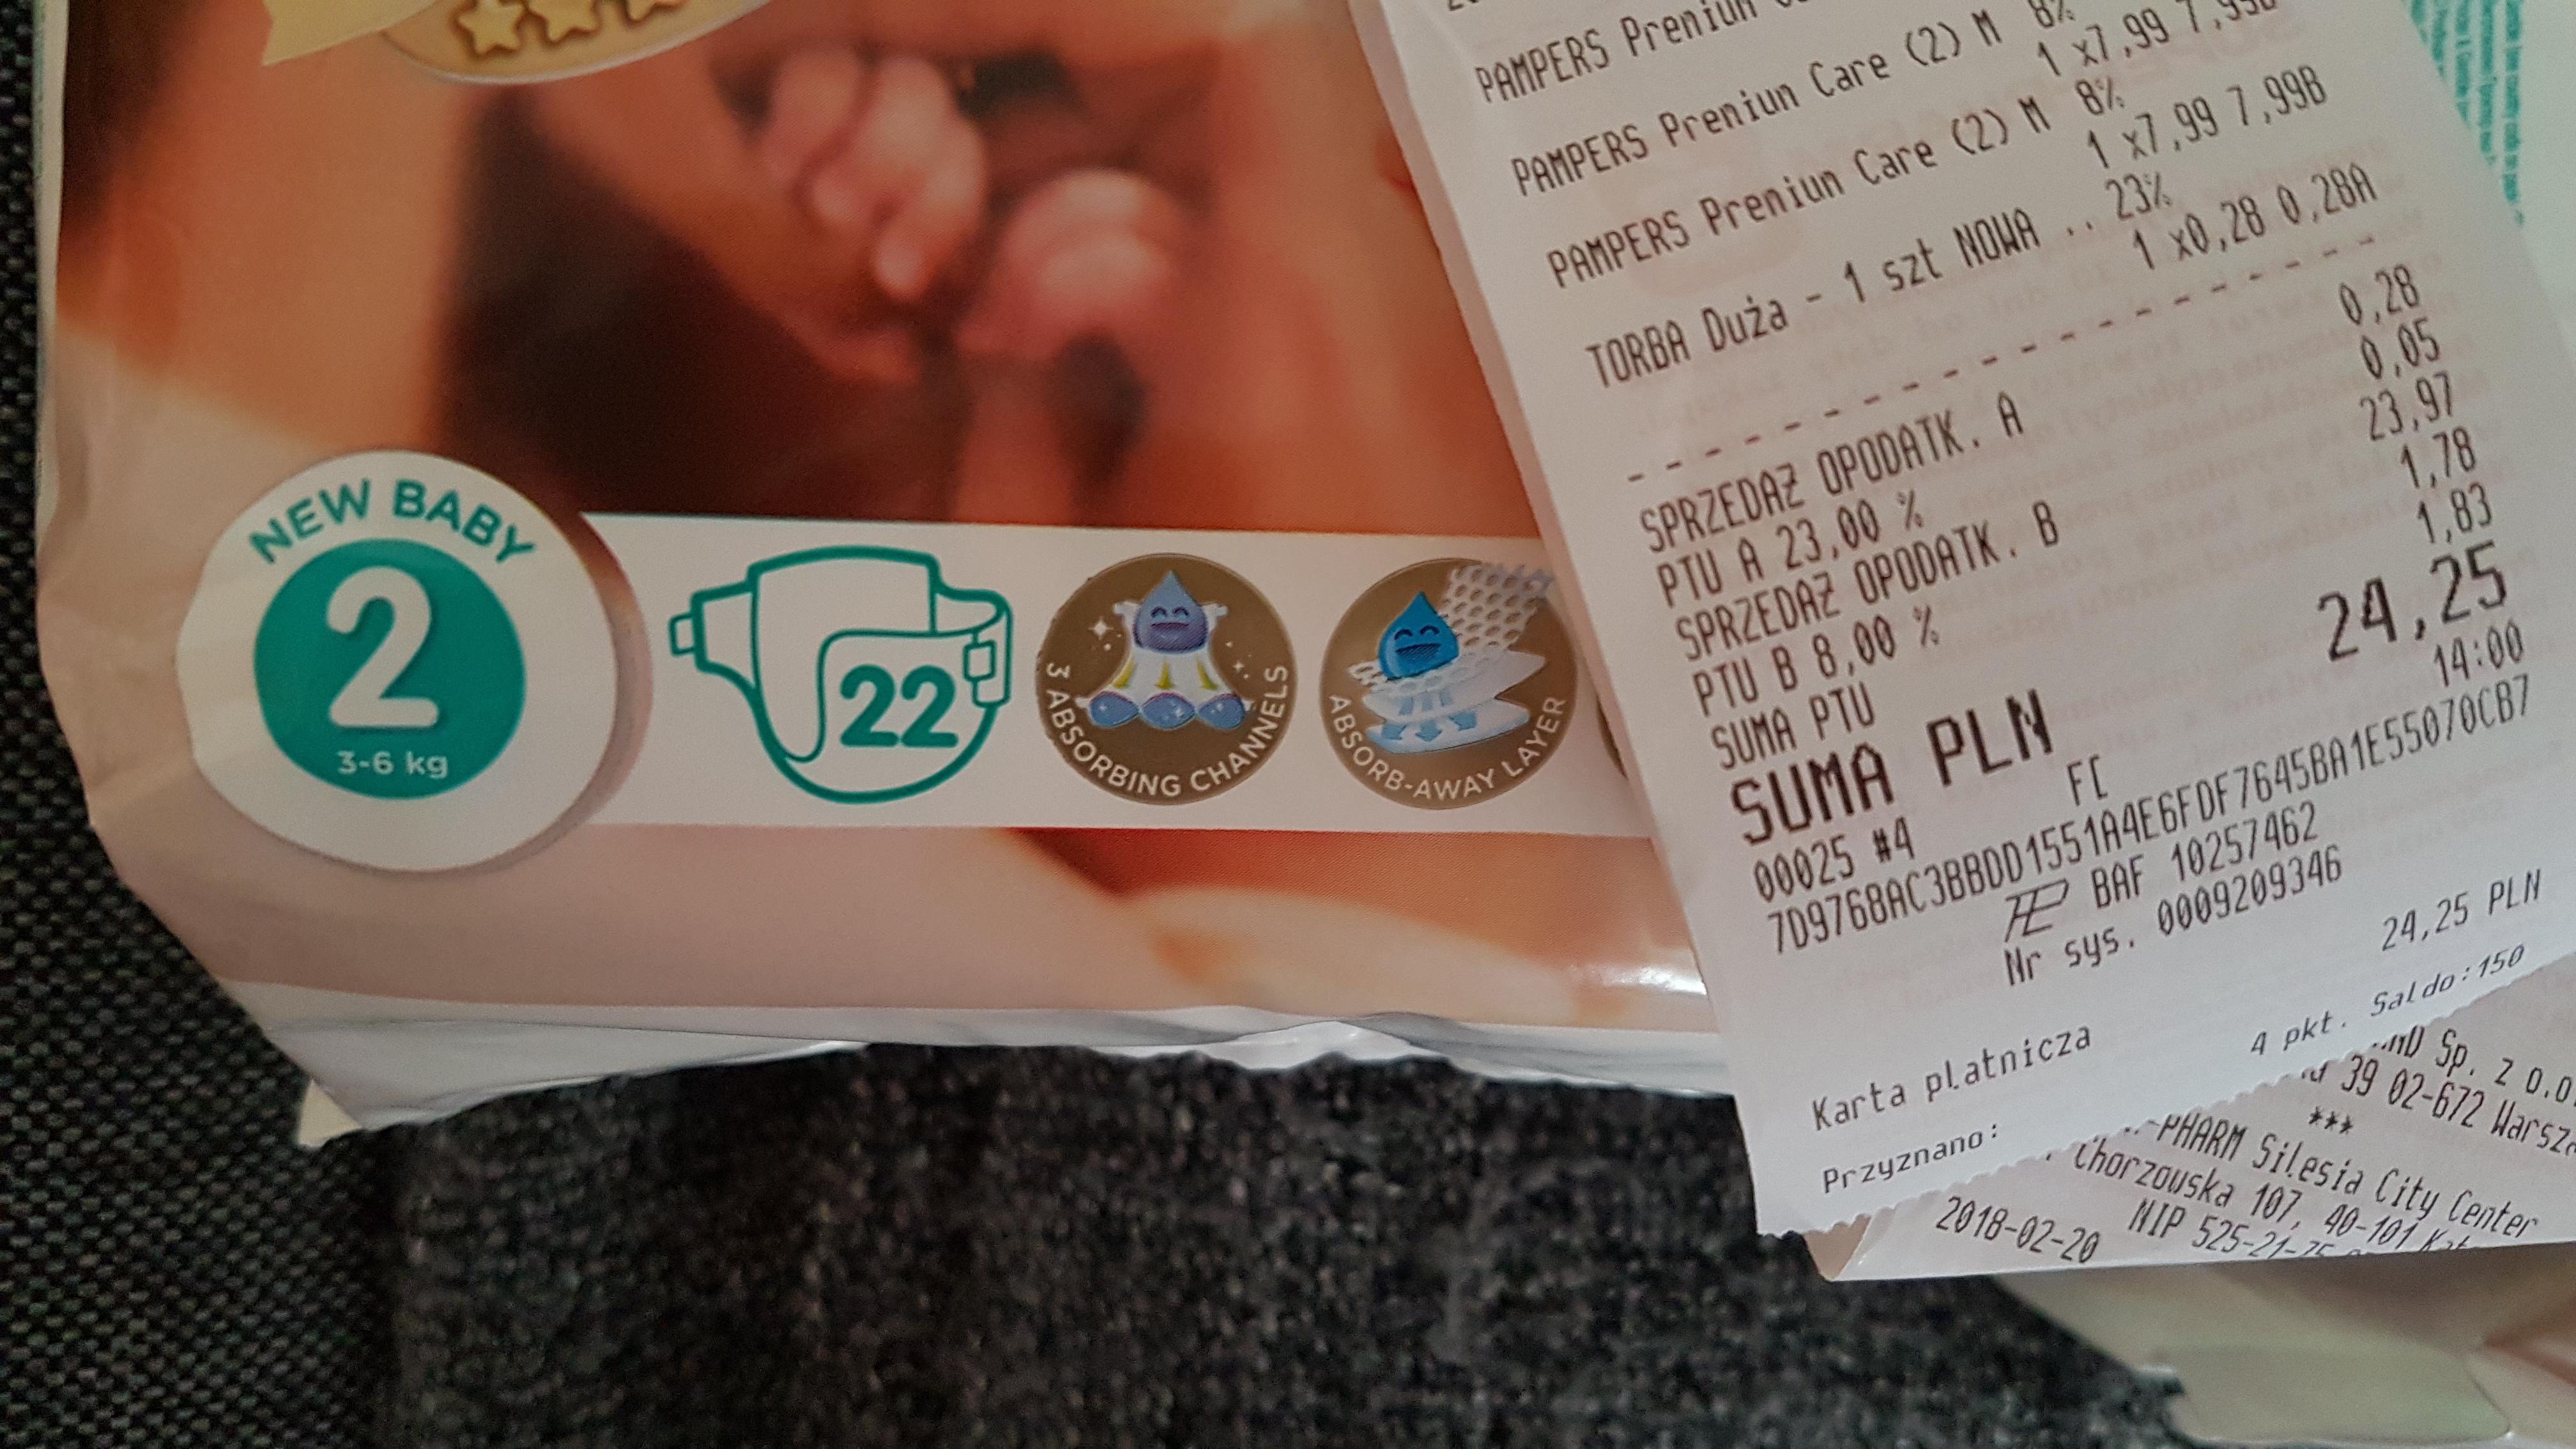 690418-Jkoxi.jpg